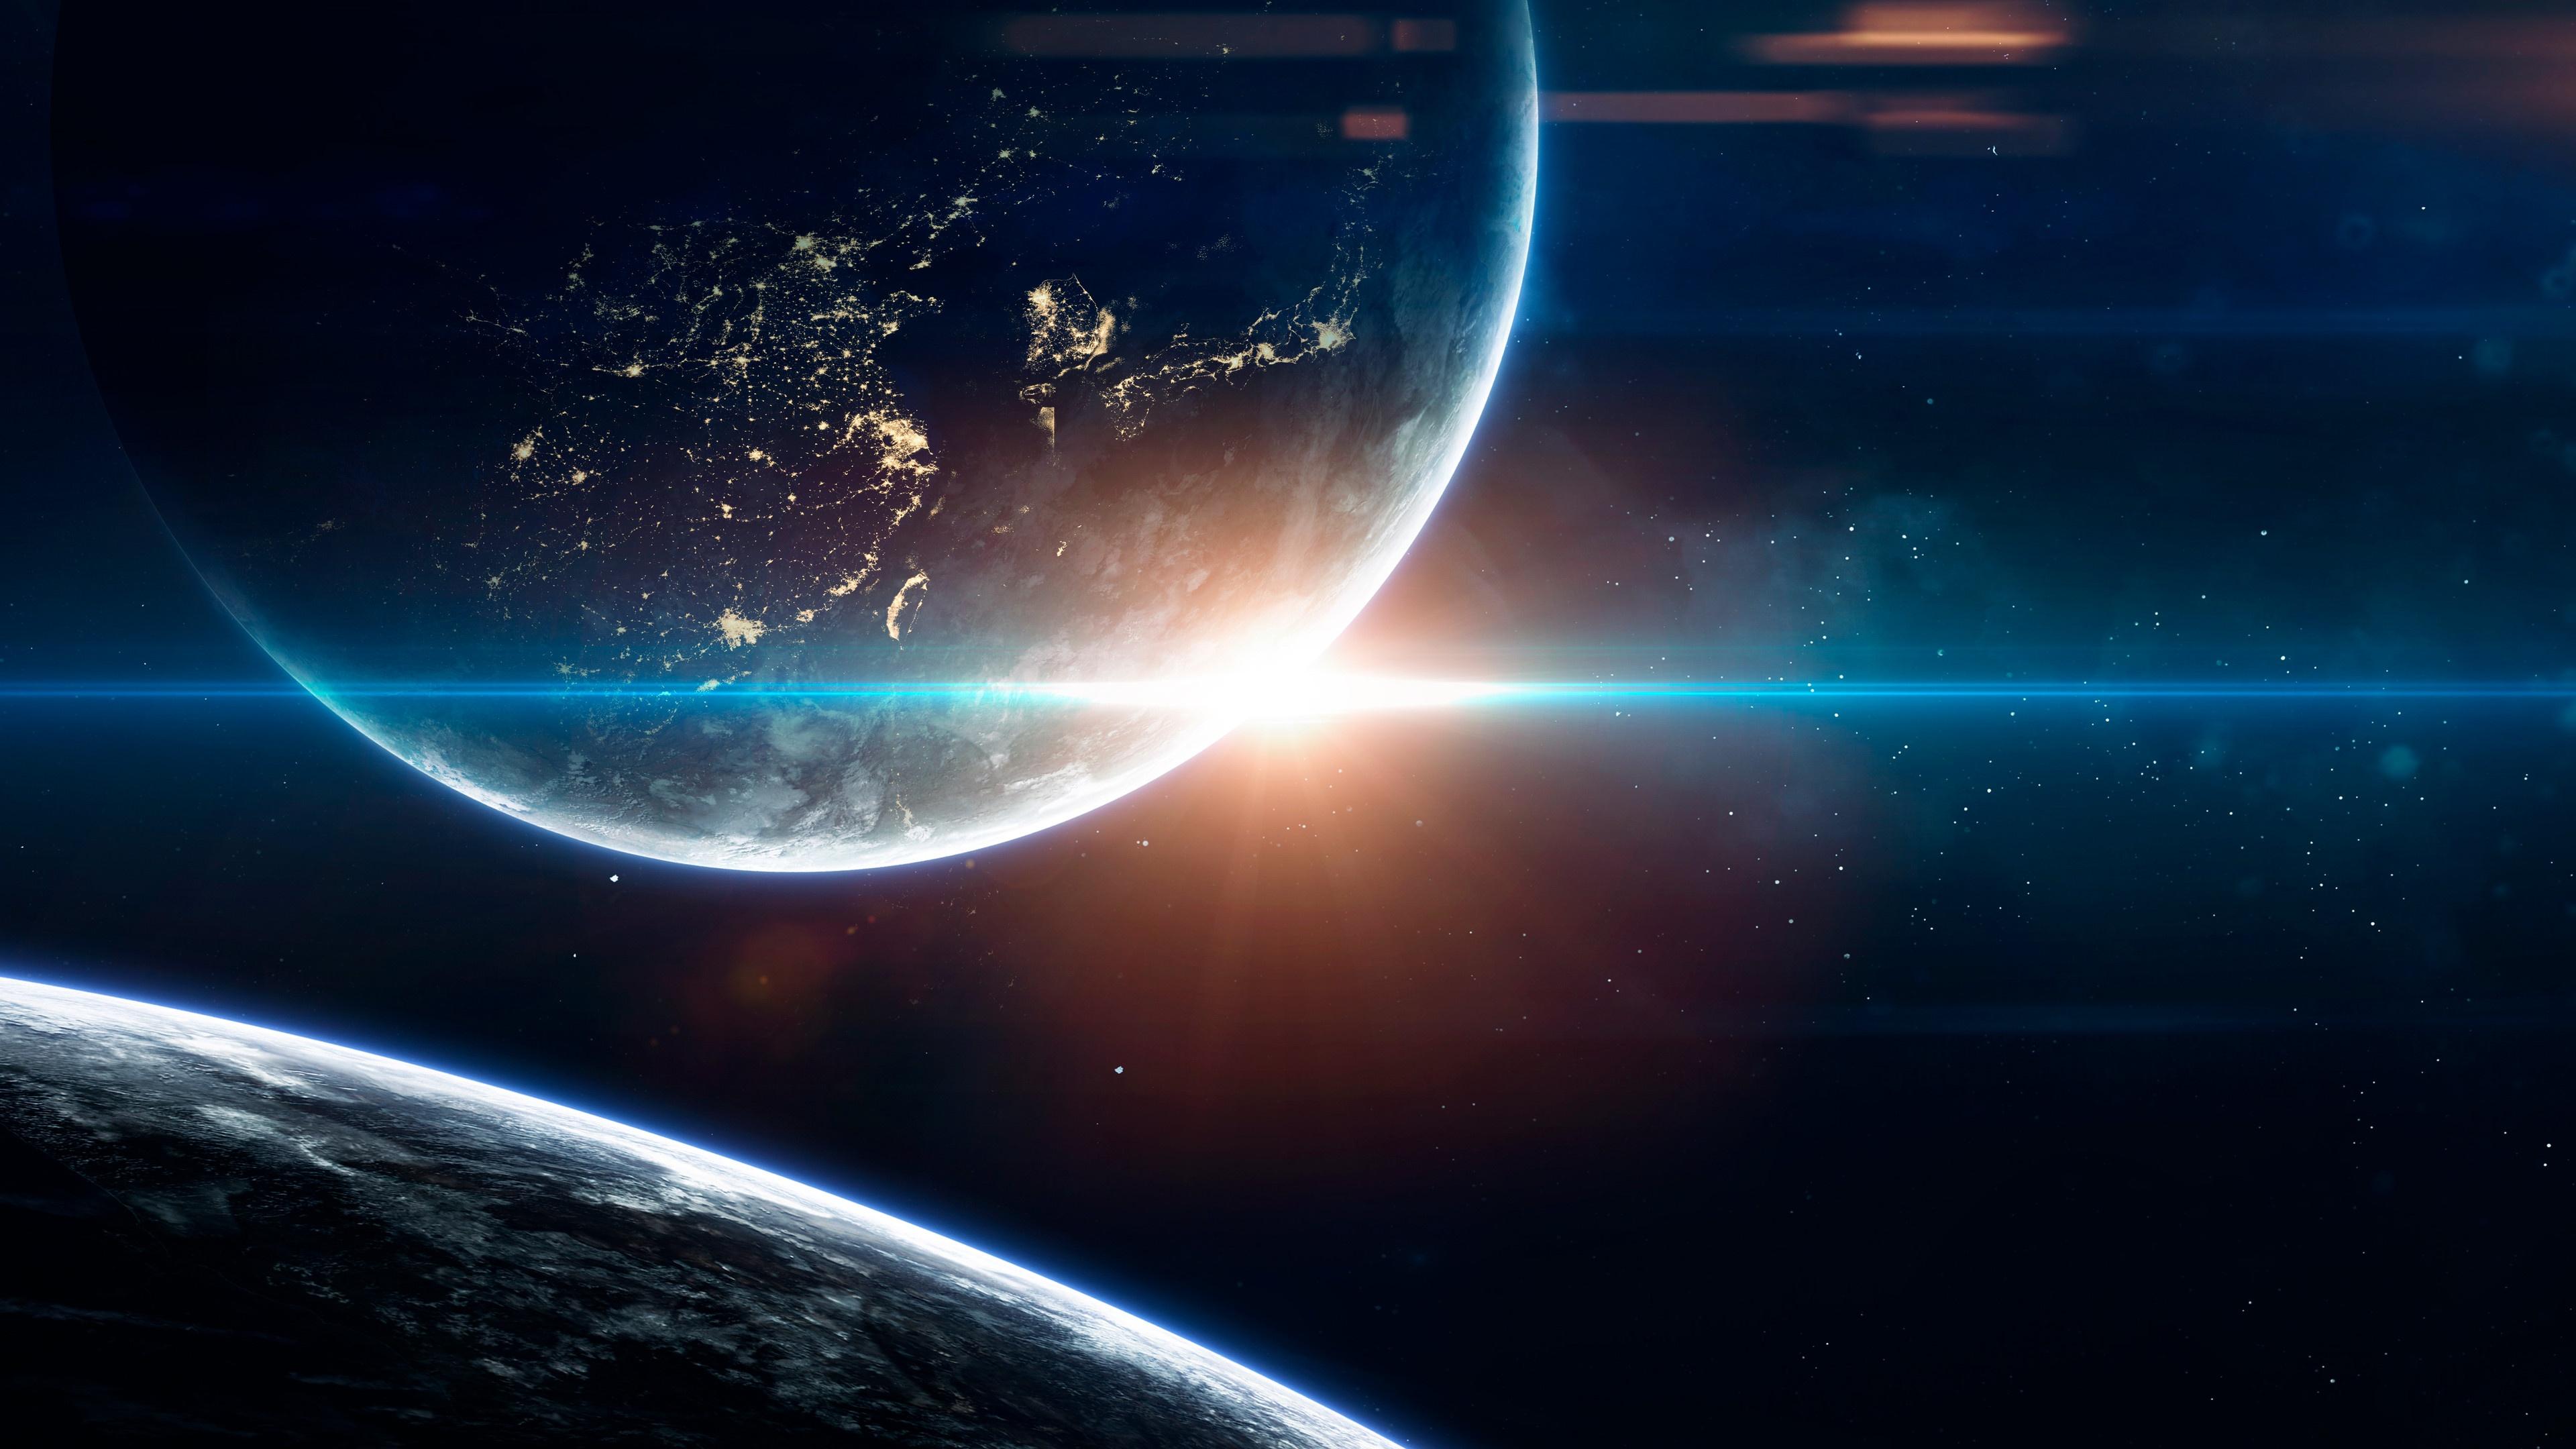 Earth 4k Wallpaper Sun Planets Stars Galaxy Blue Space 2464